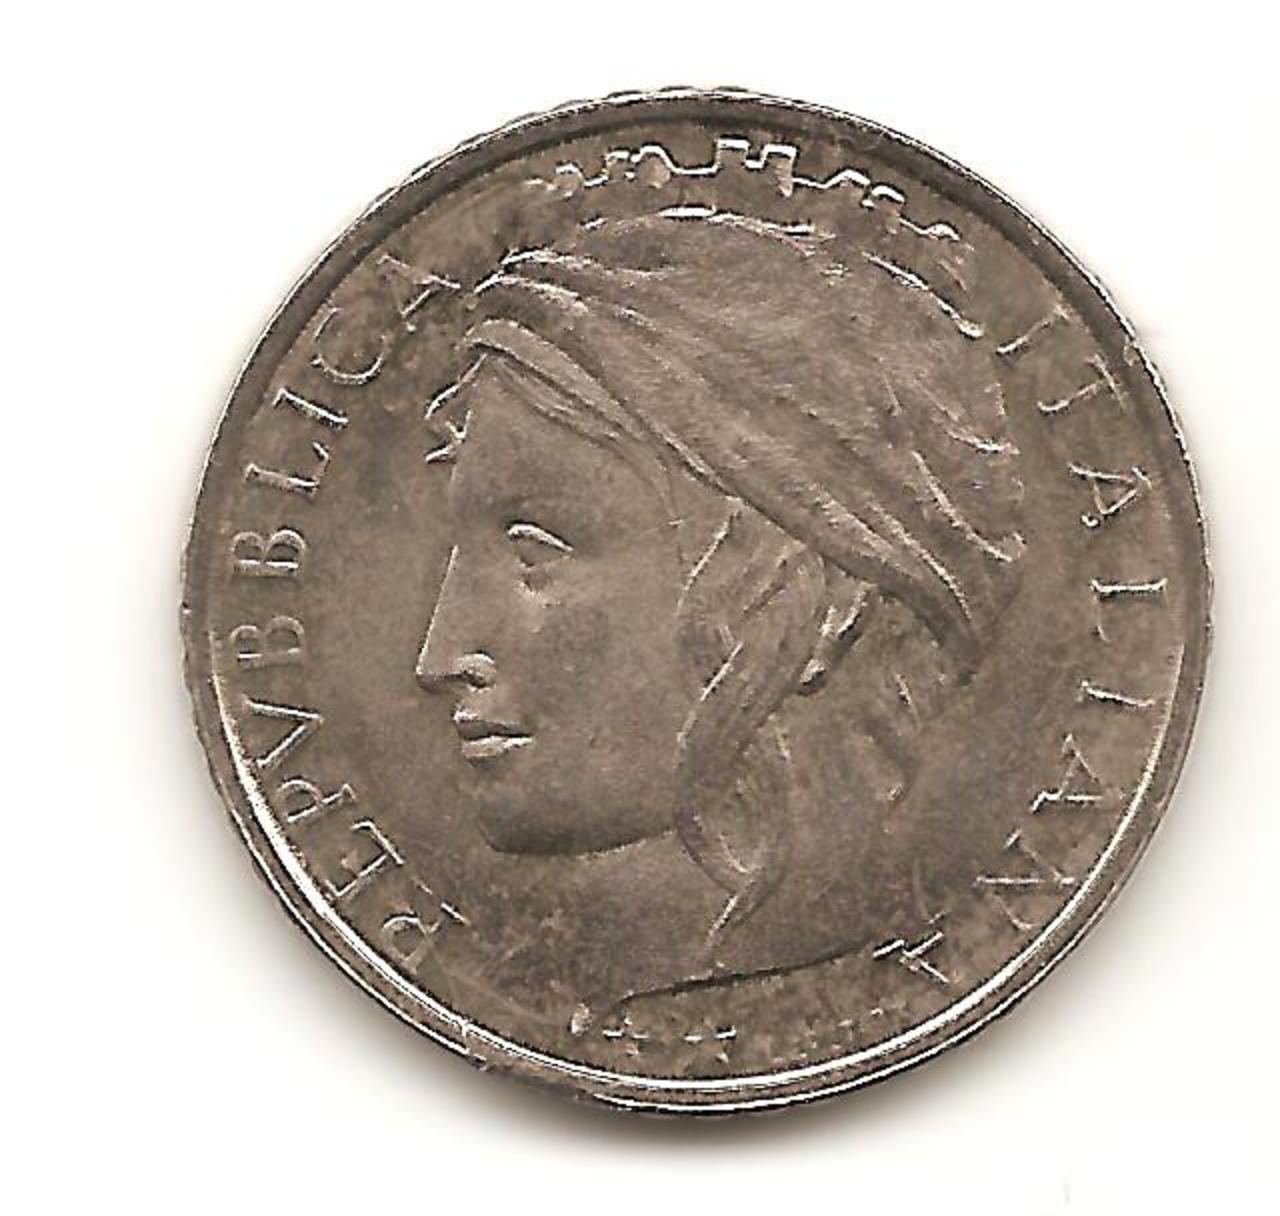 100 Lire. Italia. 1993. Roma  Image